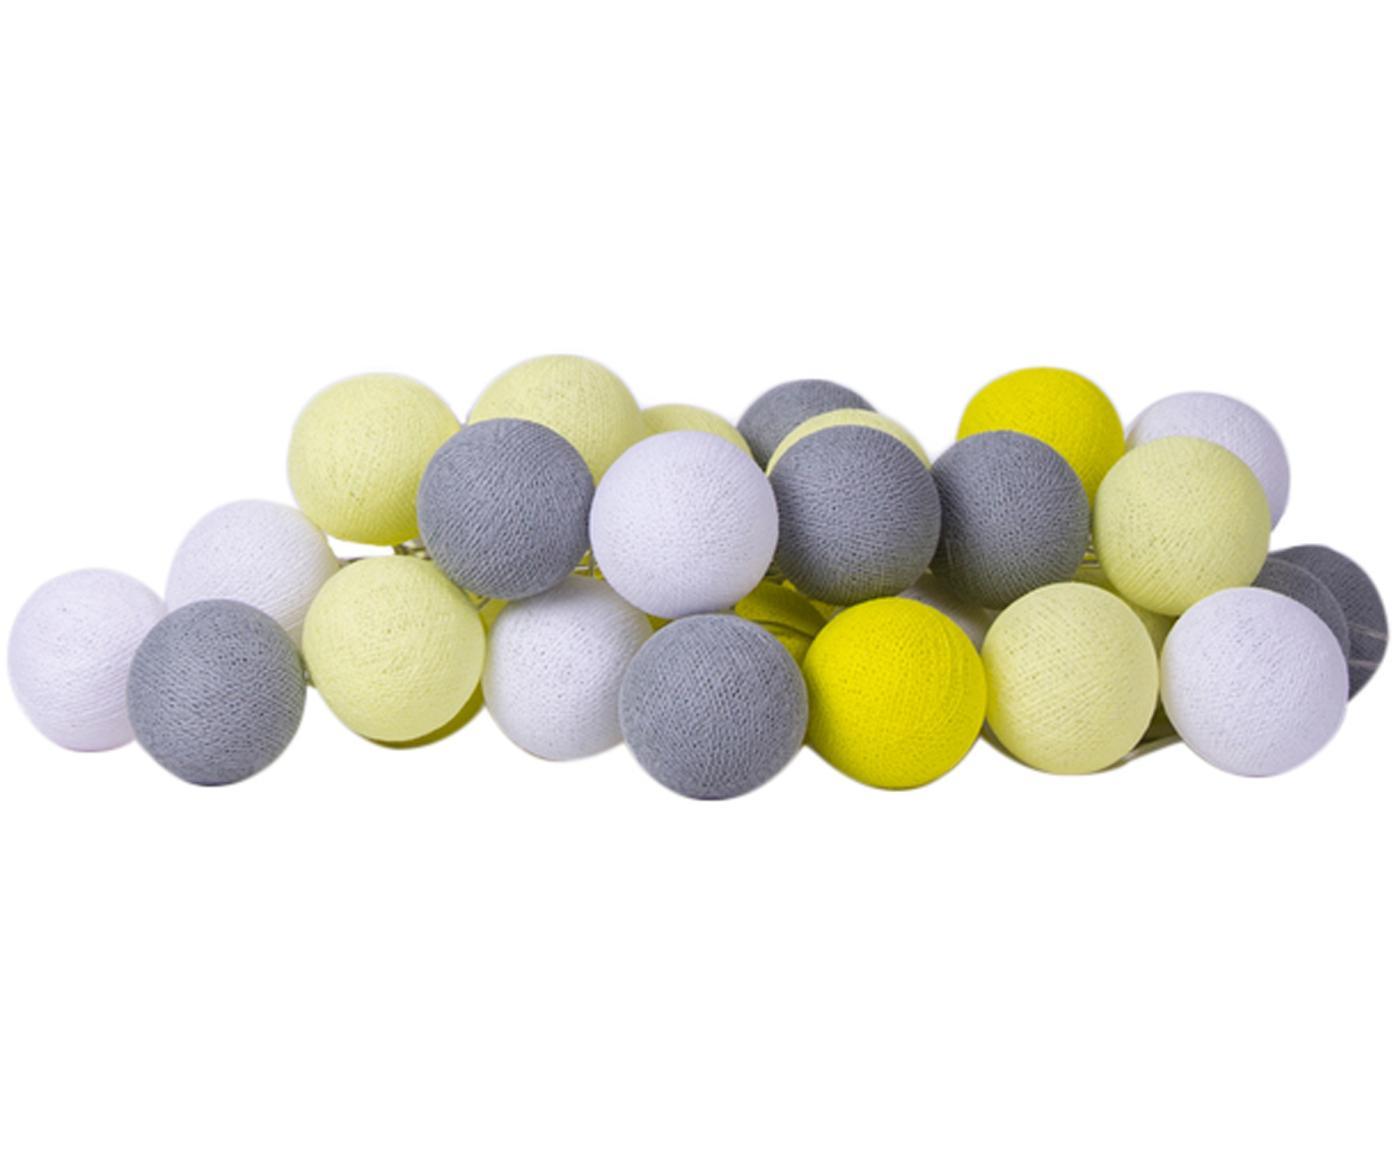 LED lichtslinger Colorain, Lampions: polyester, Geel, wit, grijstinten, L 264 cm